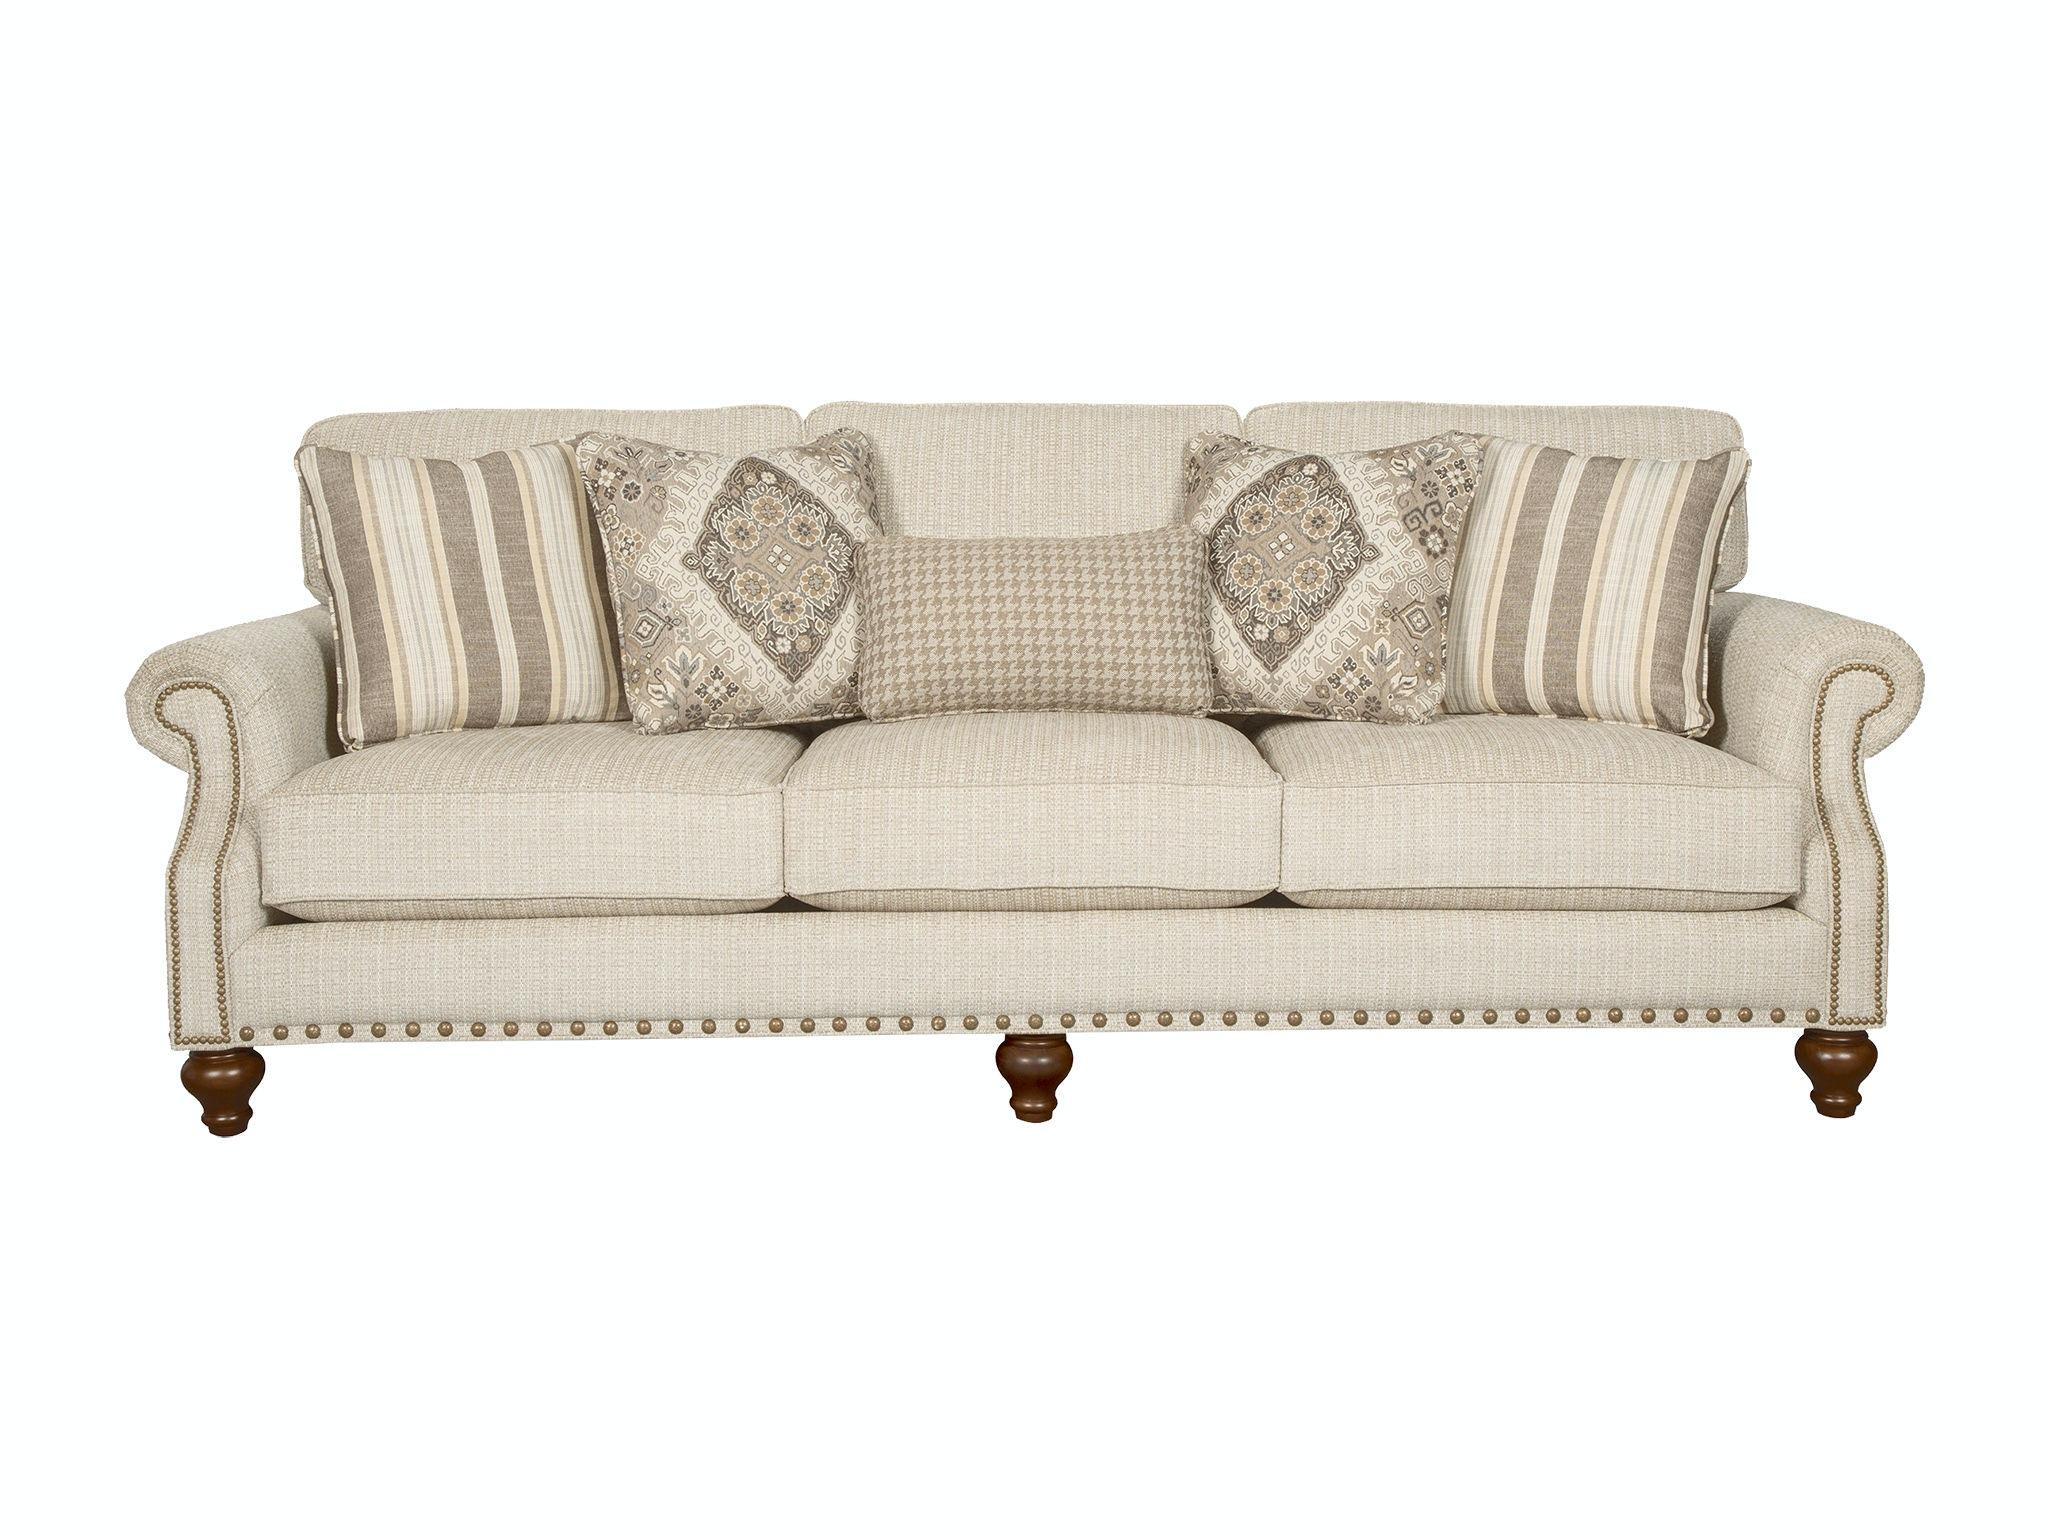 Craftmaster Furniture Sofa 762350